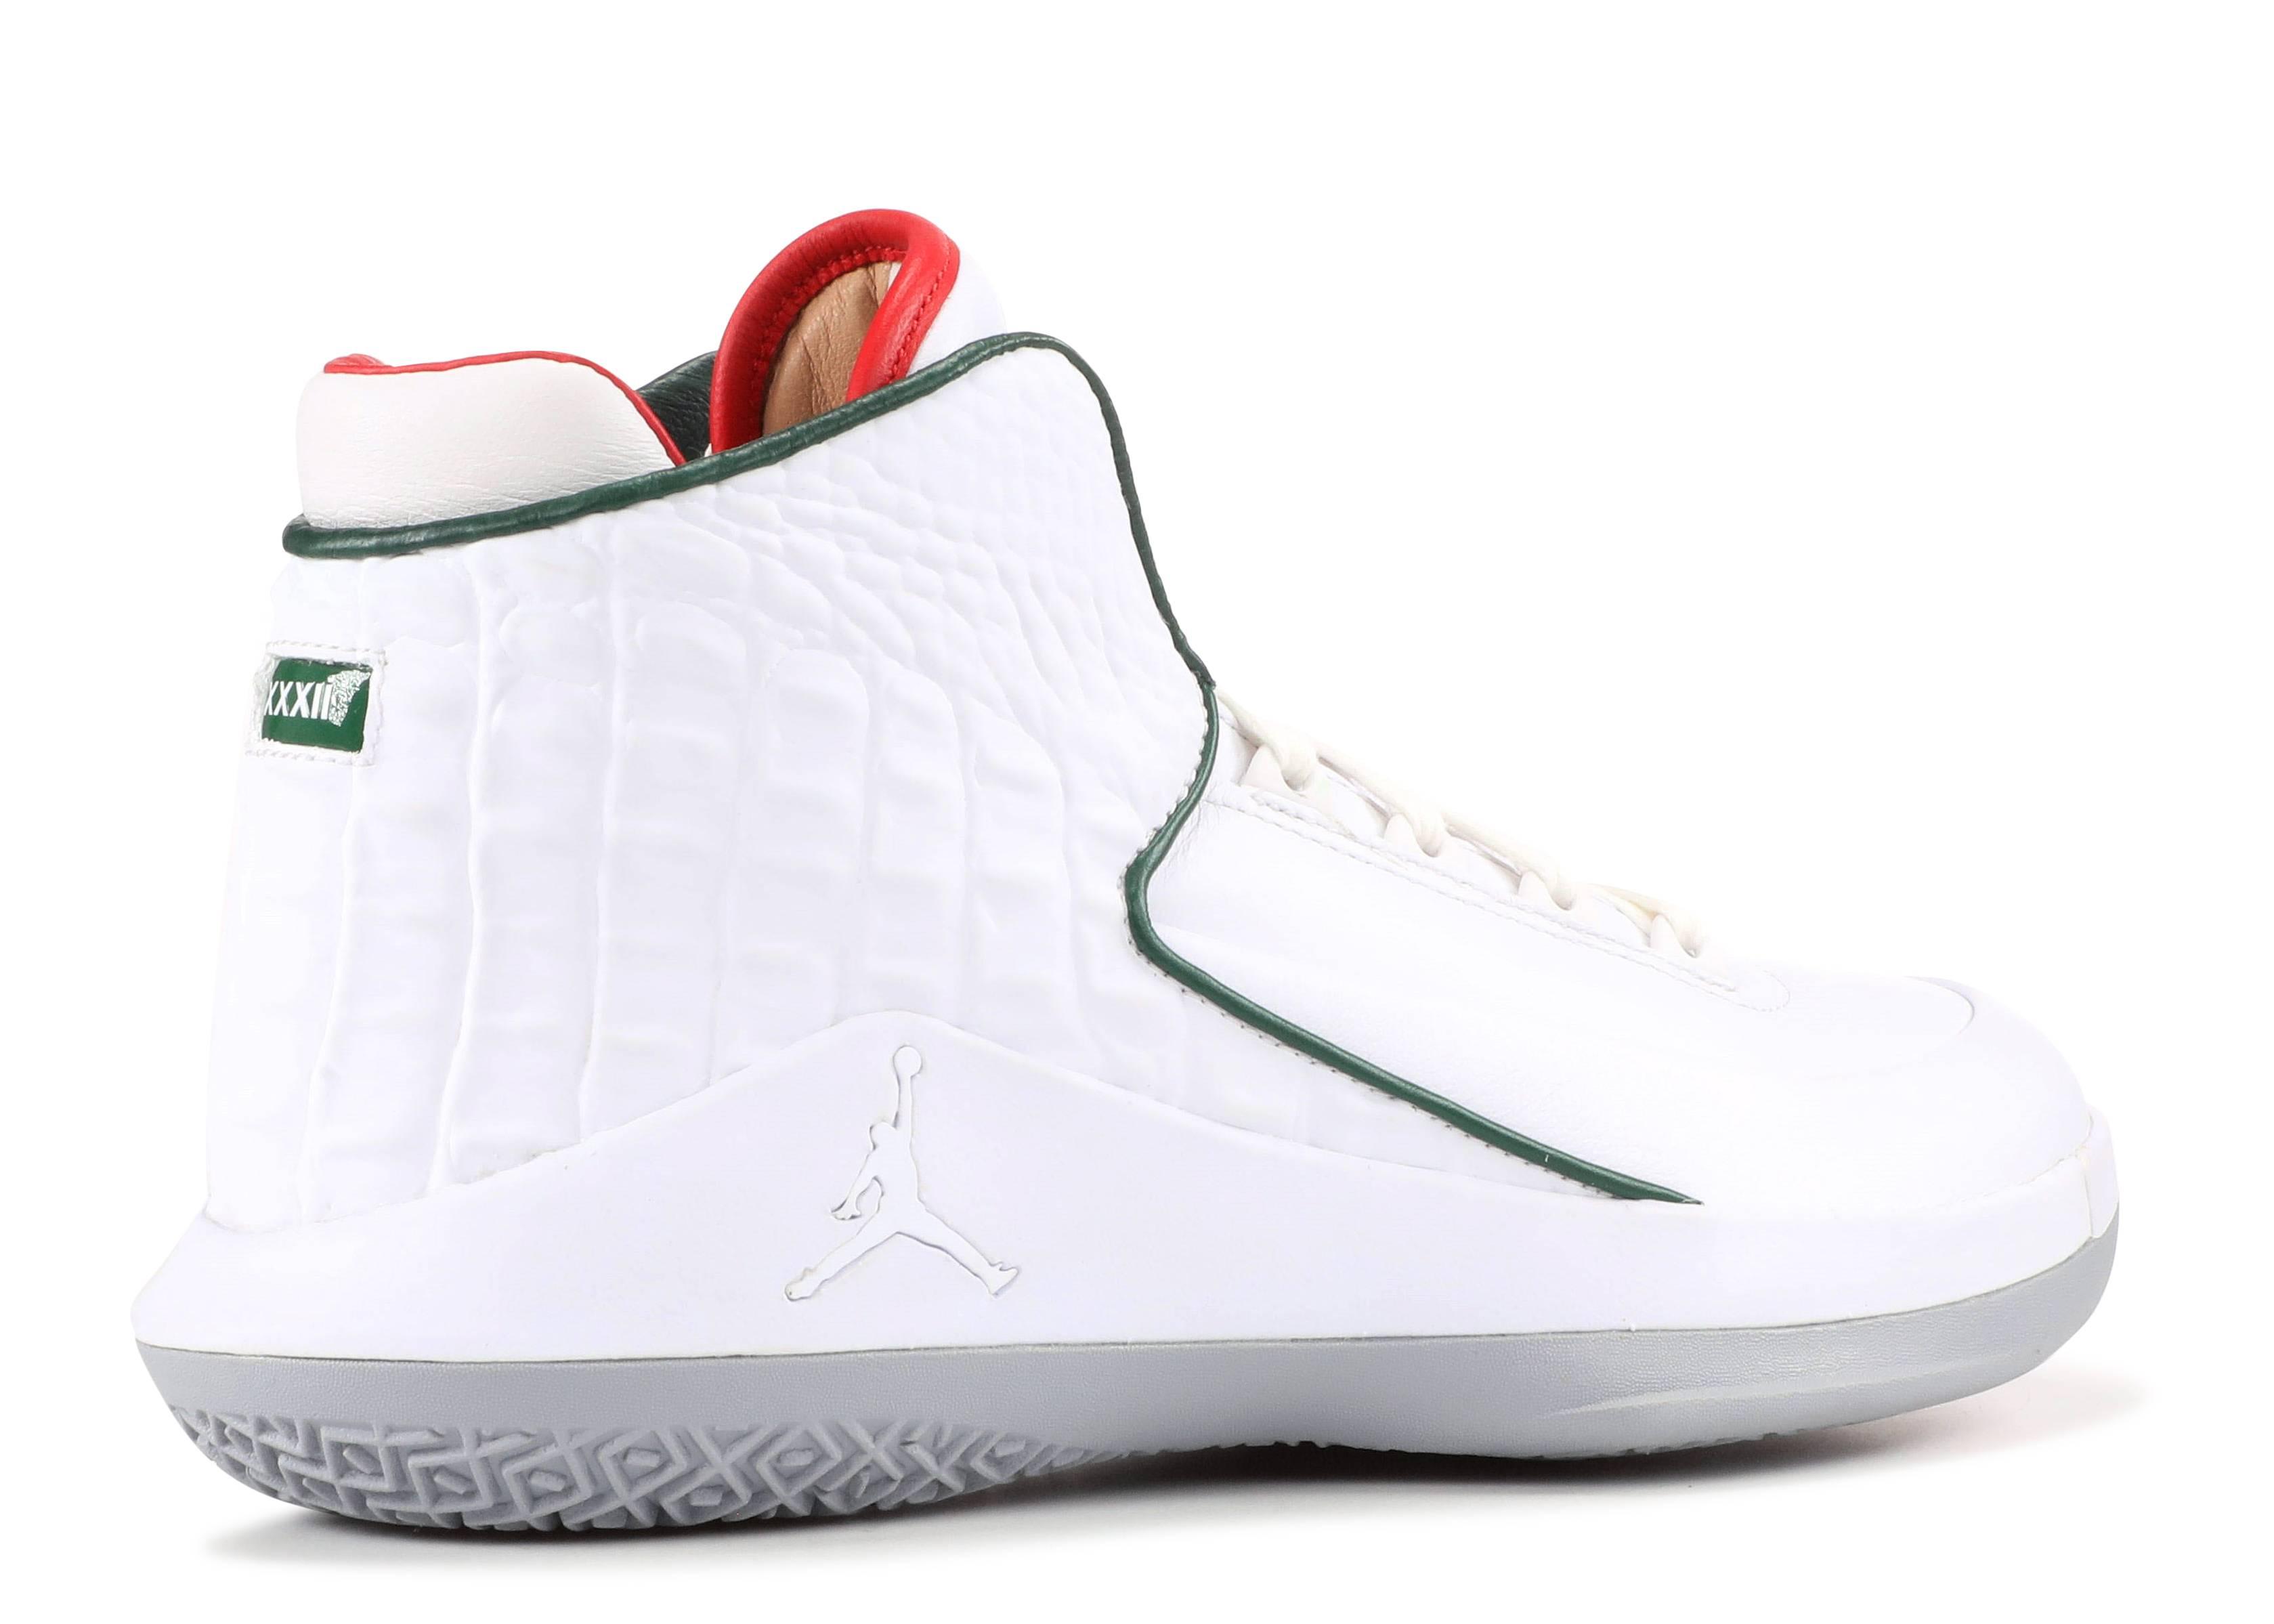 Air Jordan 32 NRG